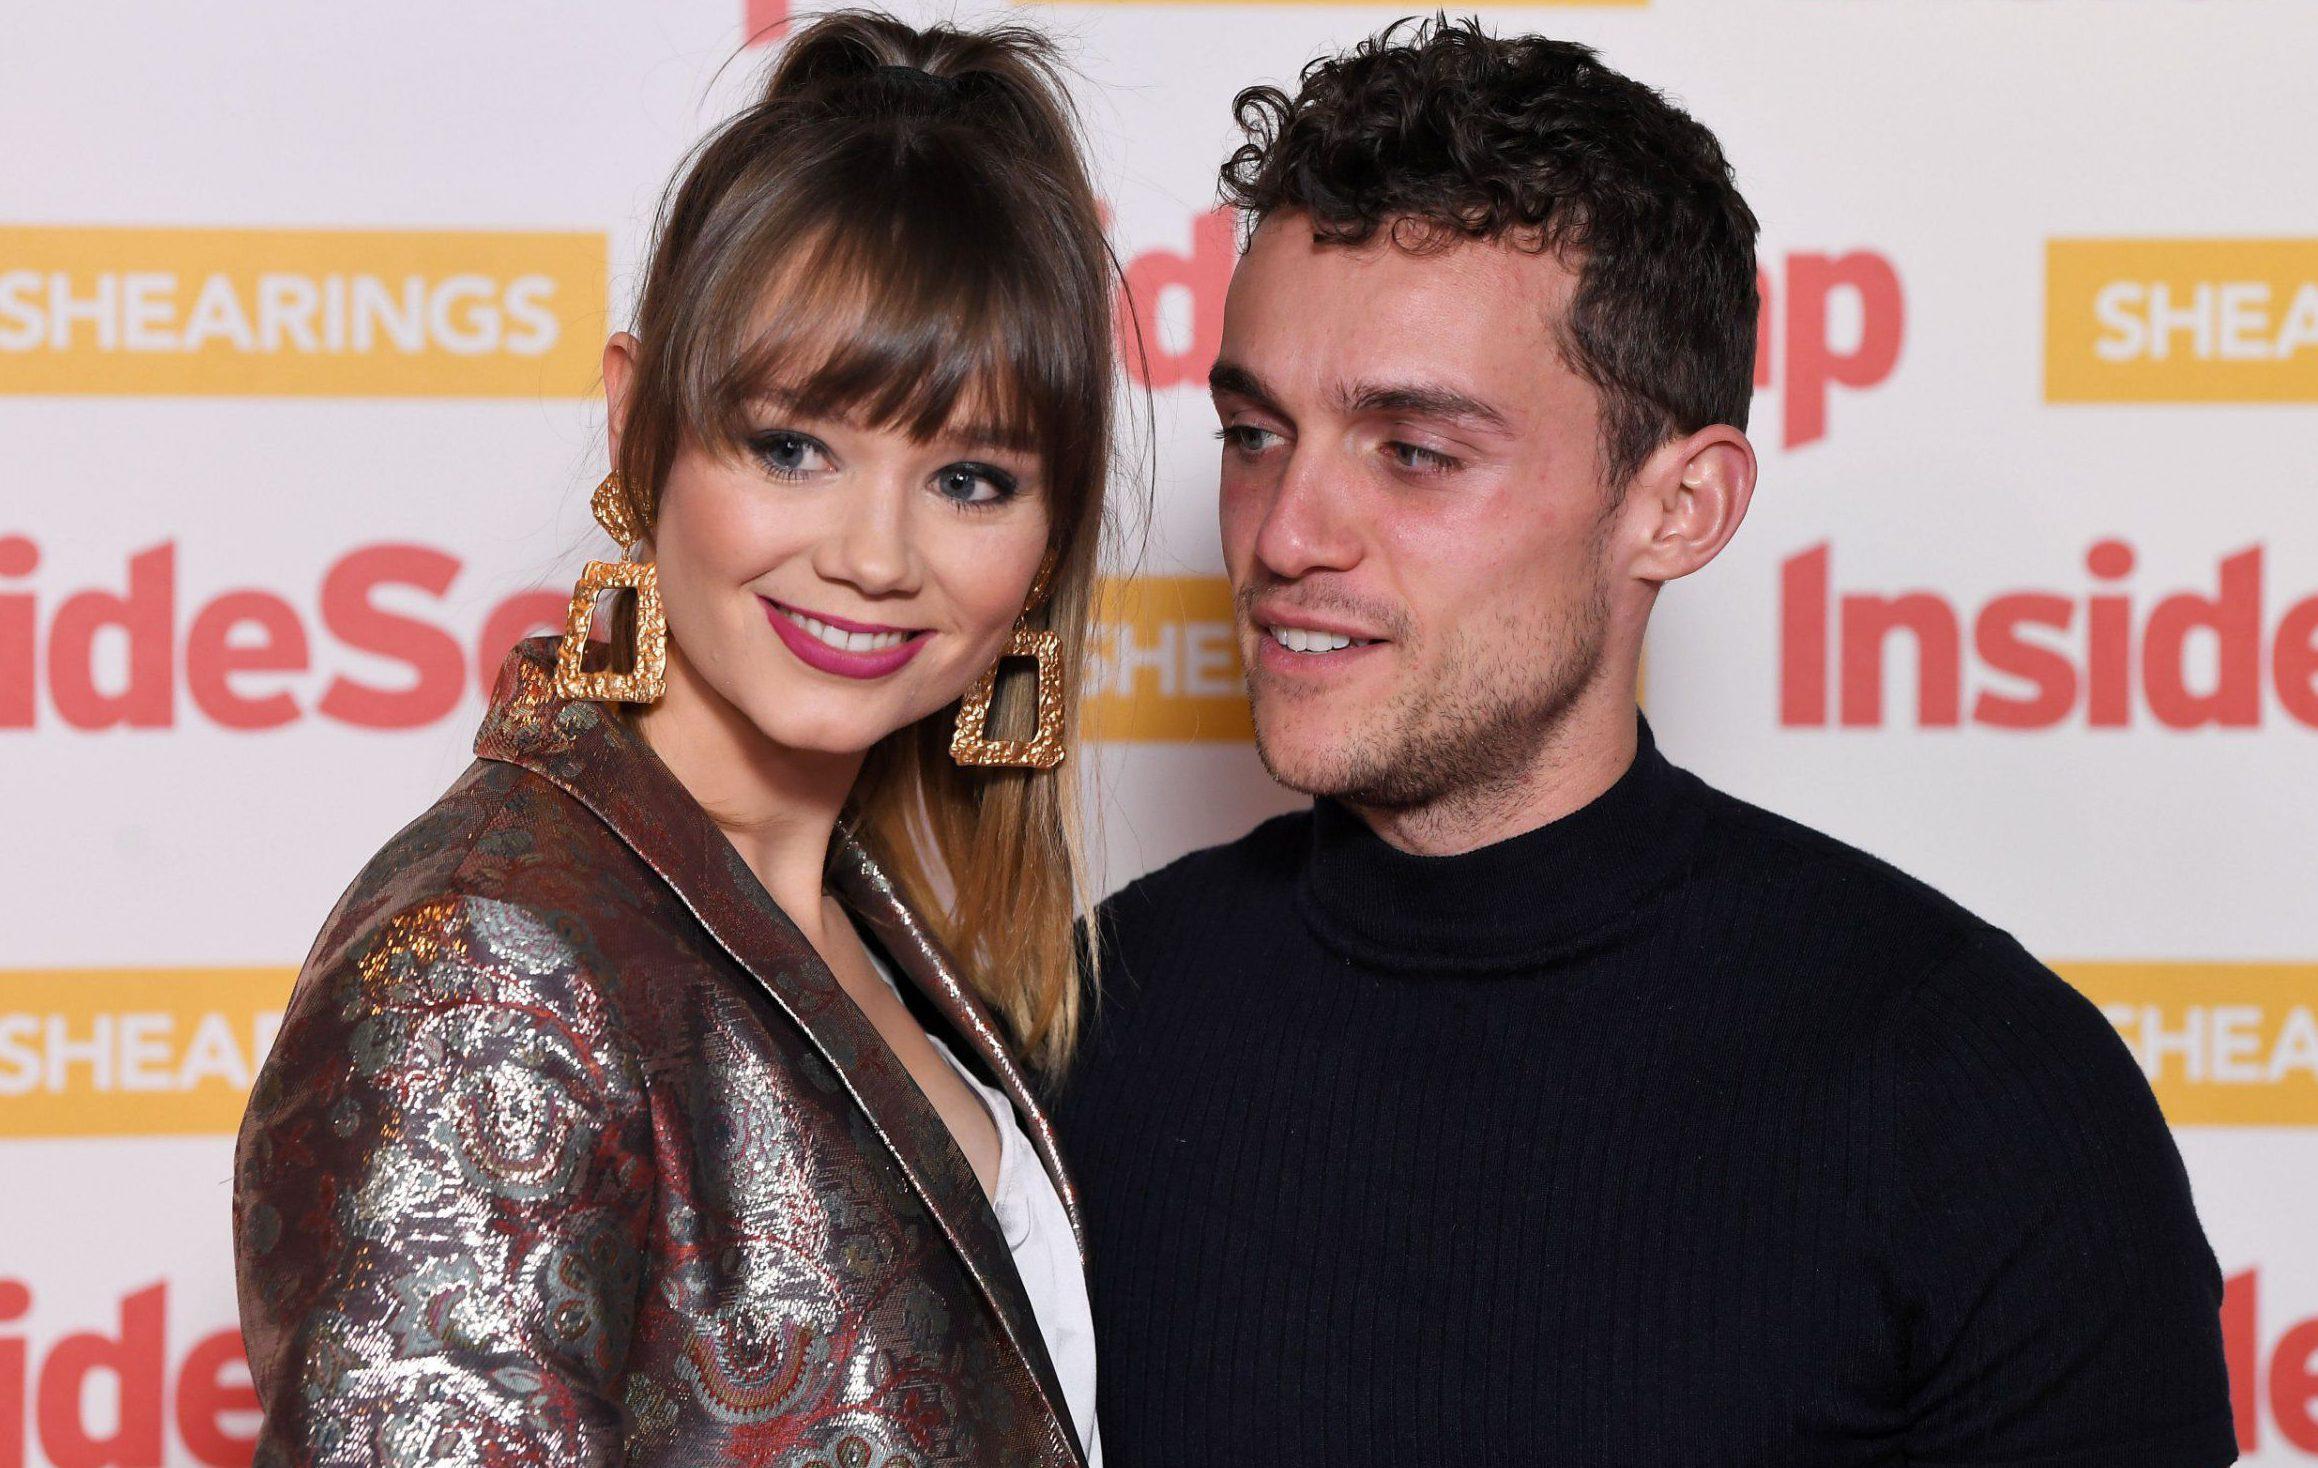 Mandatory Credit: Photo by James Gourley/REX (9939971ee) Daisy Wood-Davis and Luke Jerdy Inside Soap Awards, London, UK - 22 Oct 2018